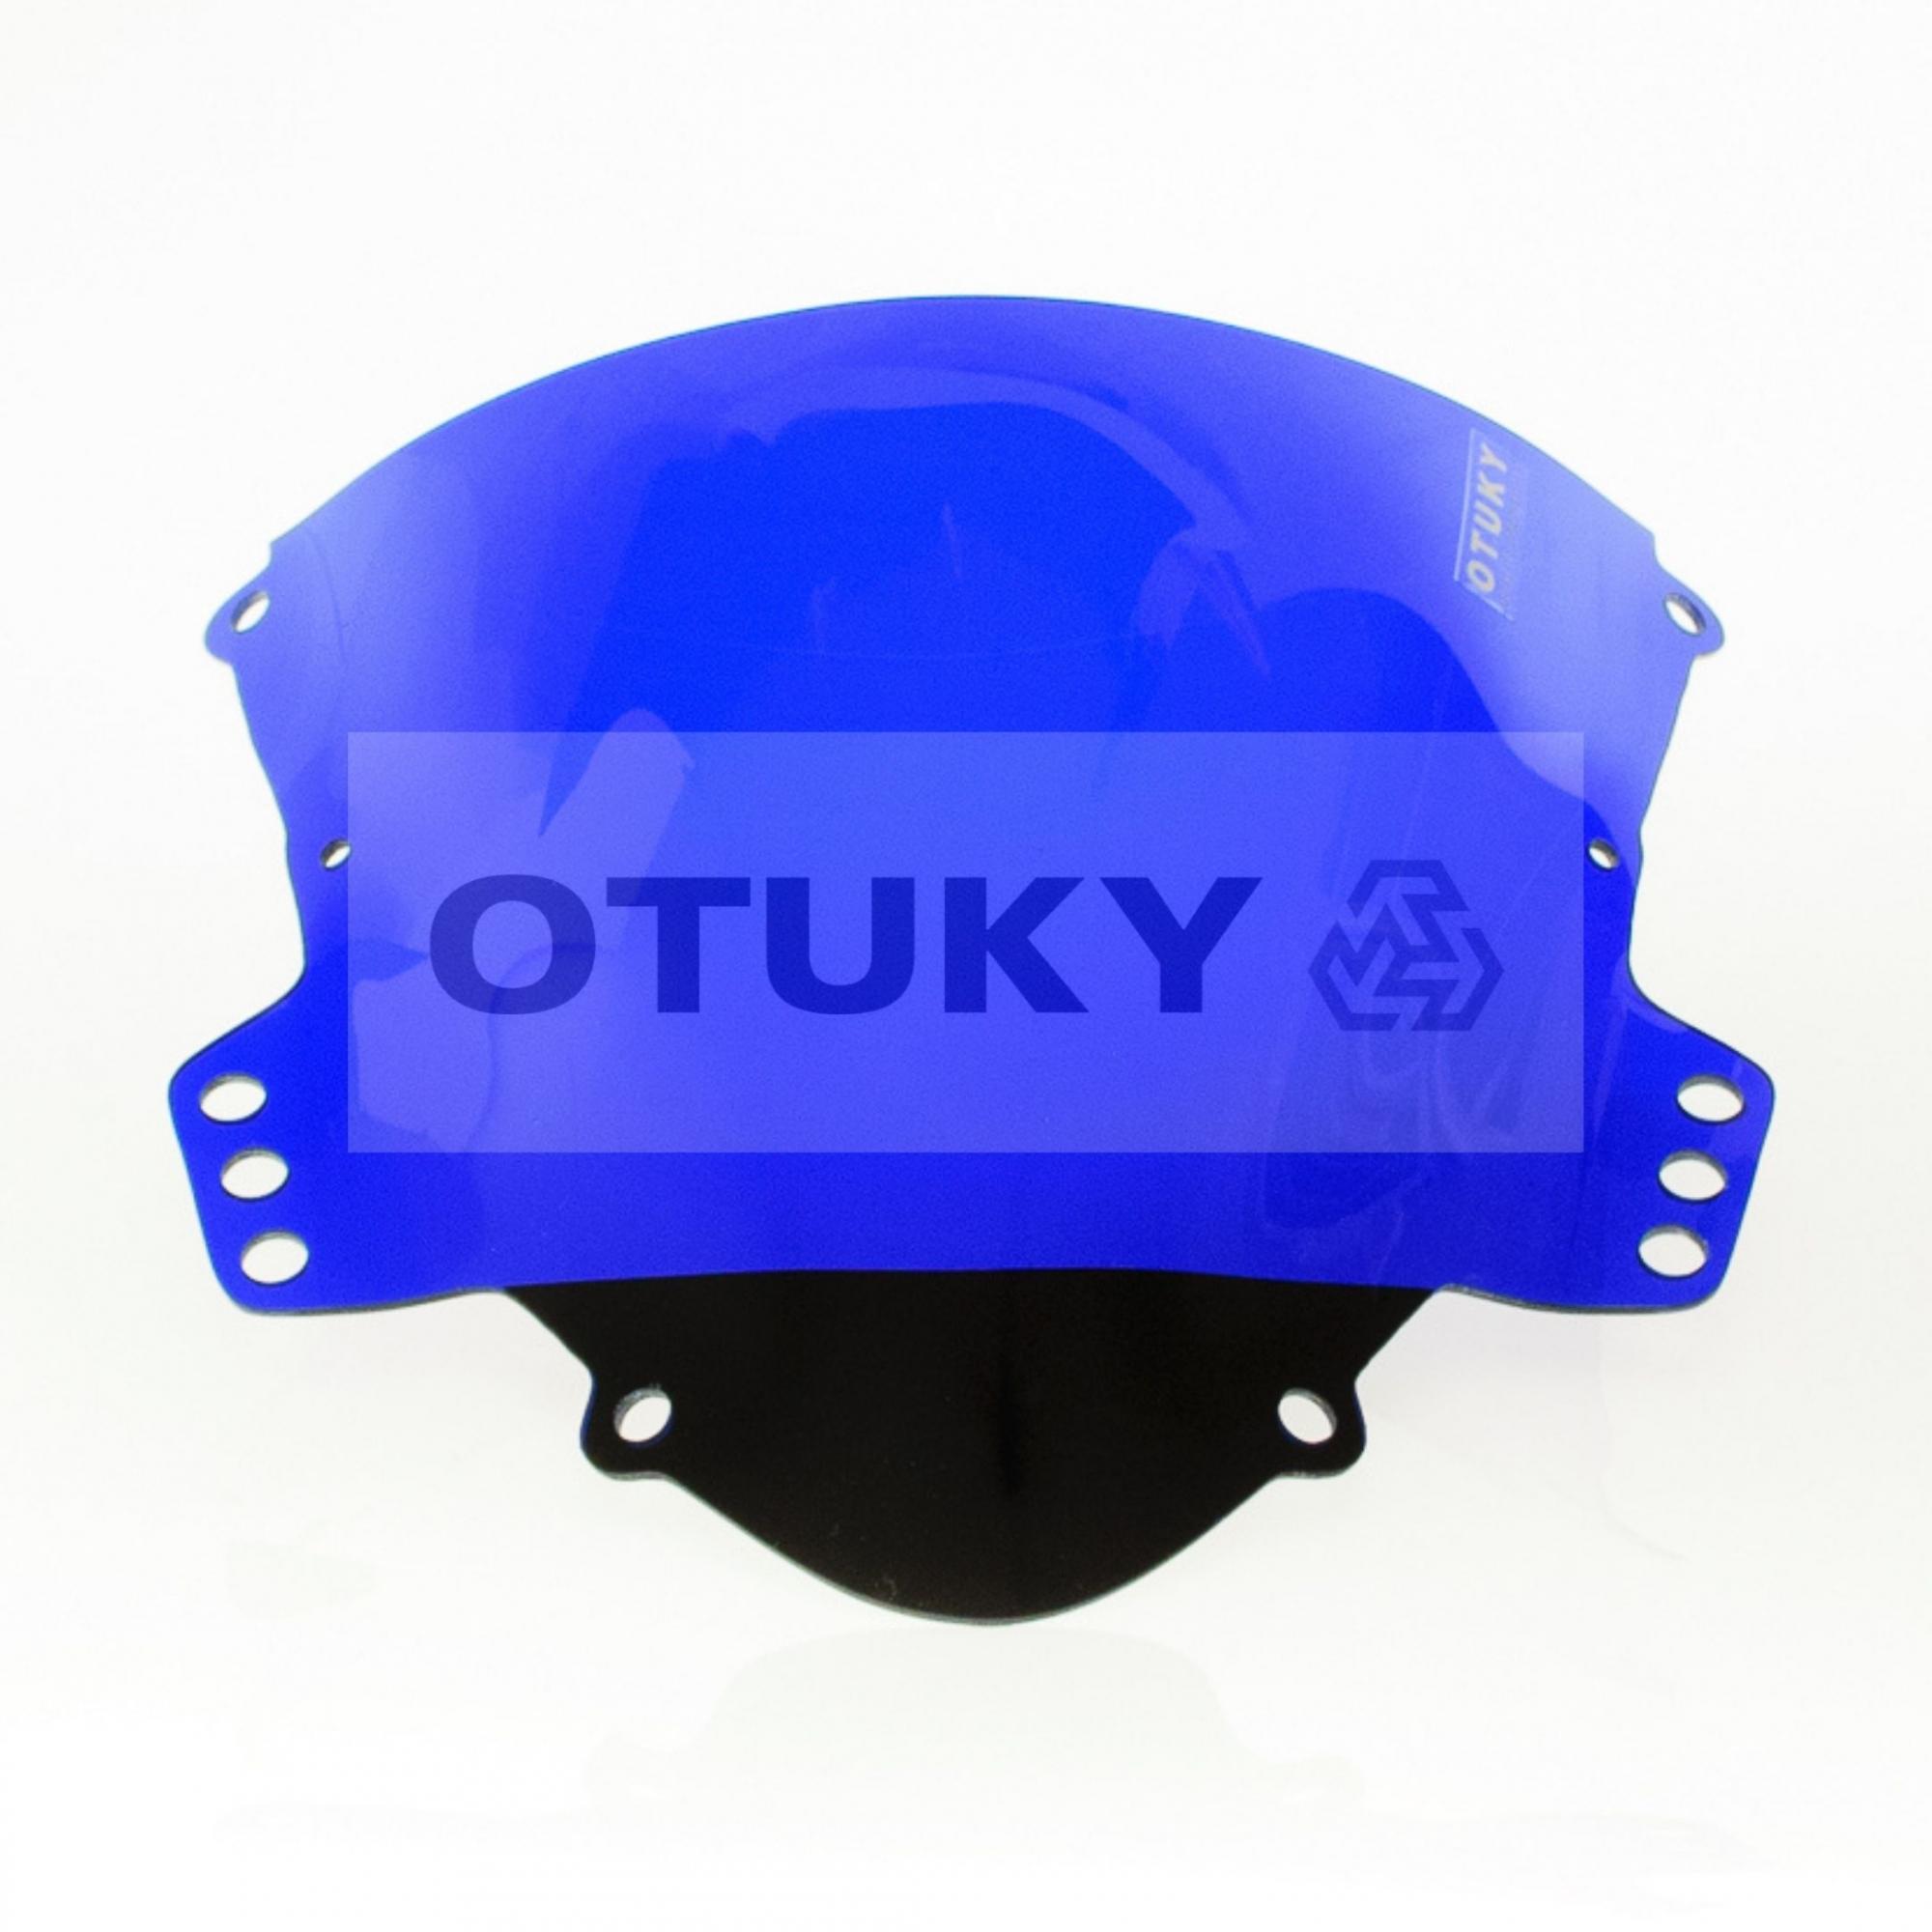 Bolha Para Moto Srad 1000 GSX-R 2006 2007 K5 Otuky Azul-Escuro